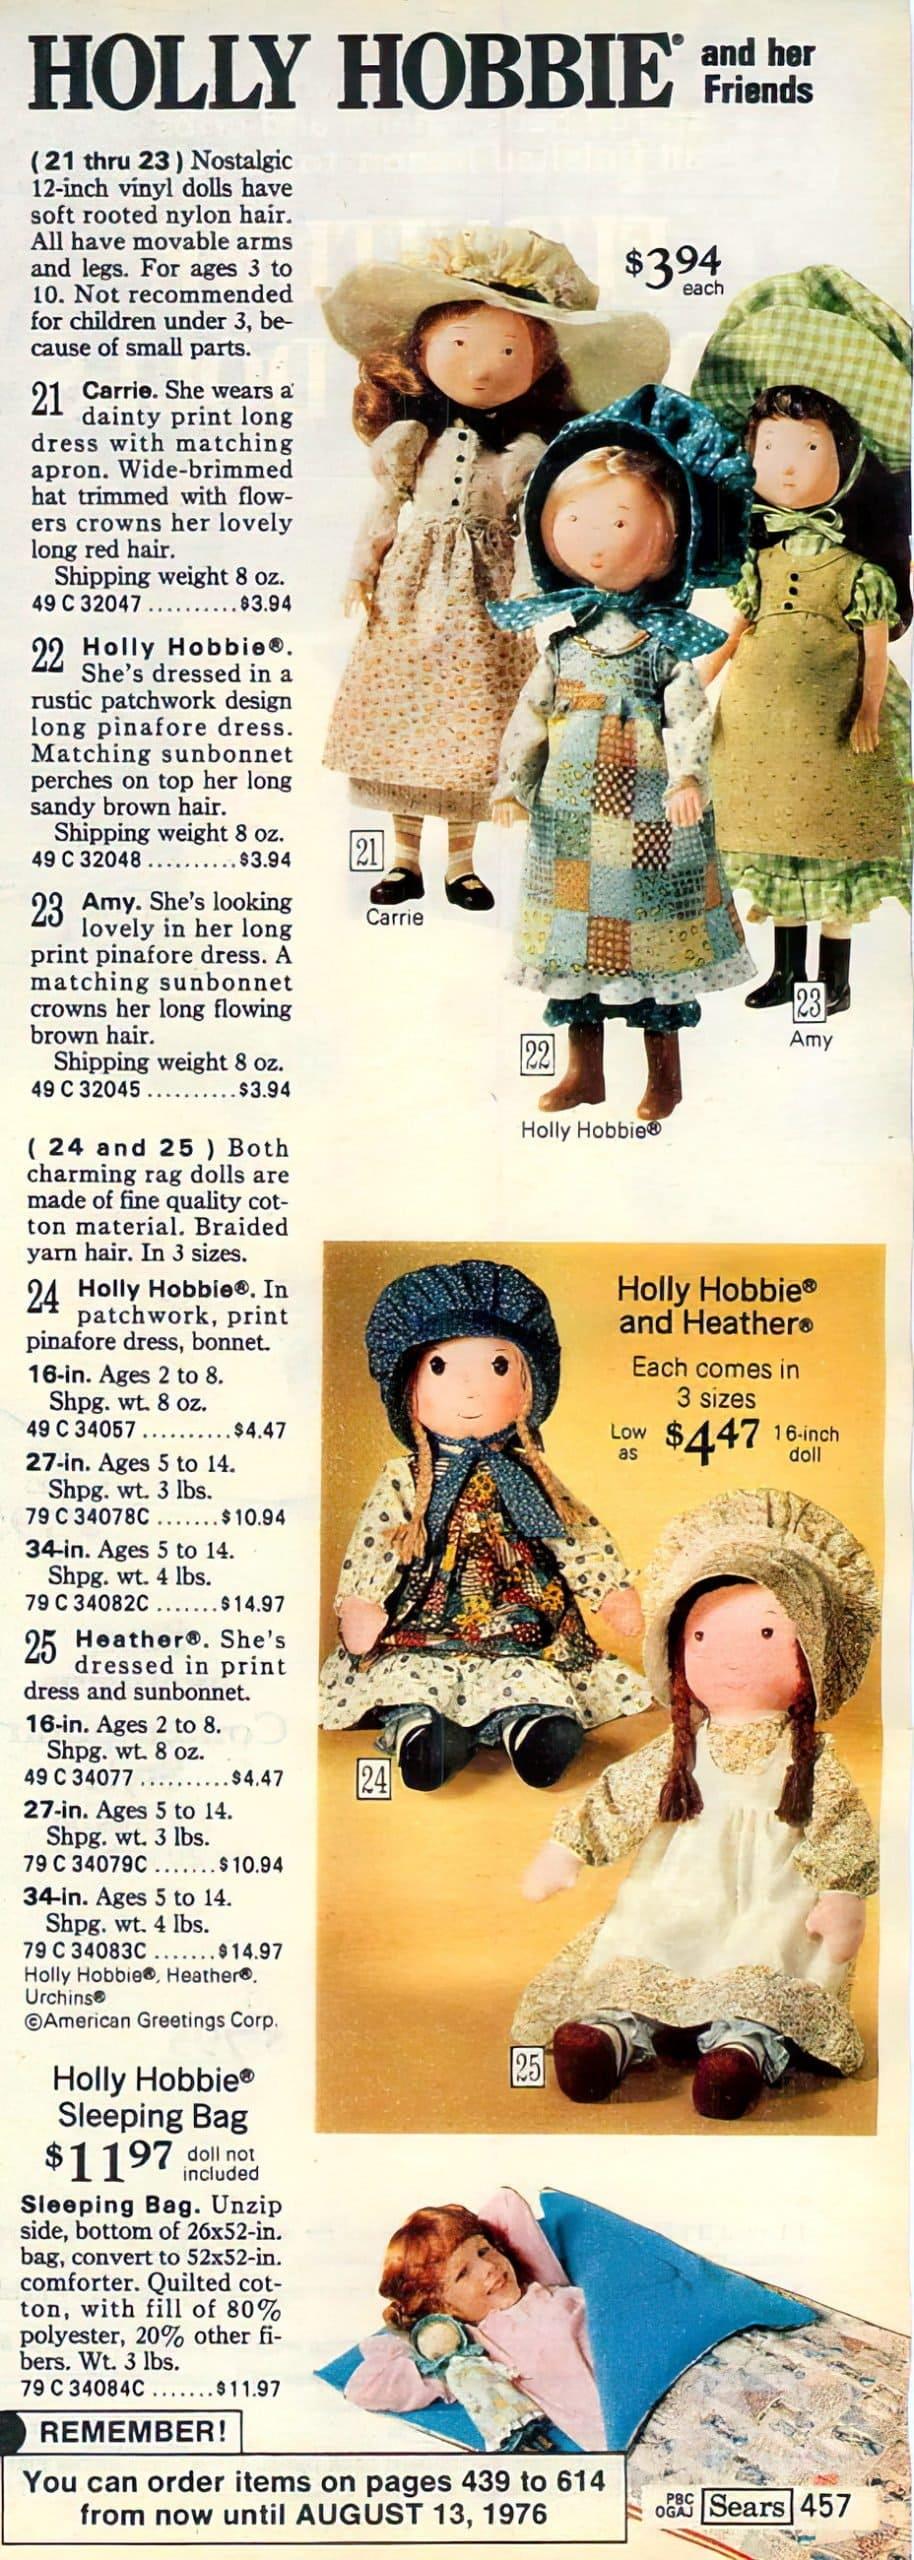 Vintage Hollie Hobbie toys and dolls at Sears 1975